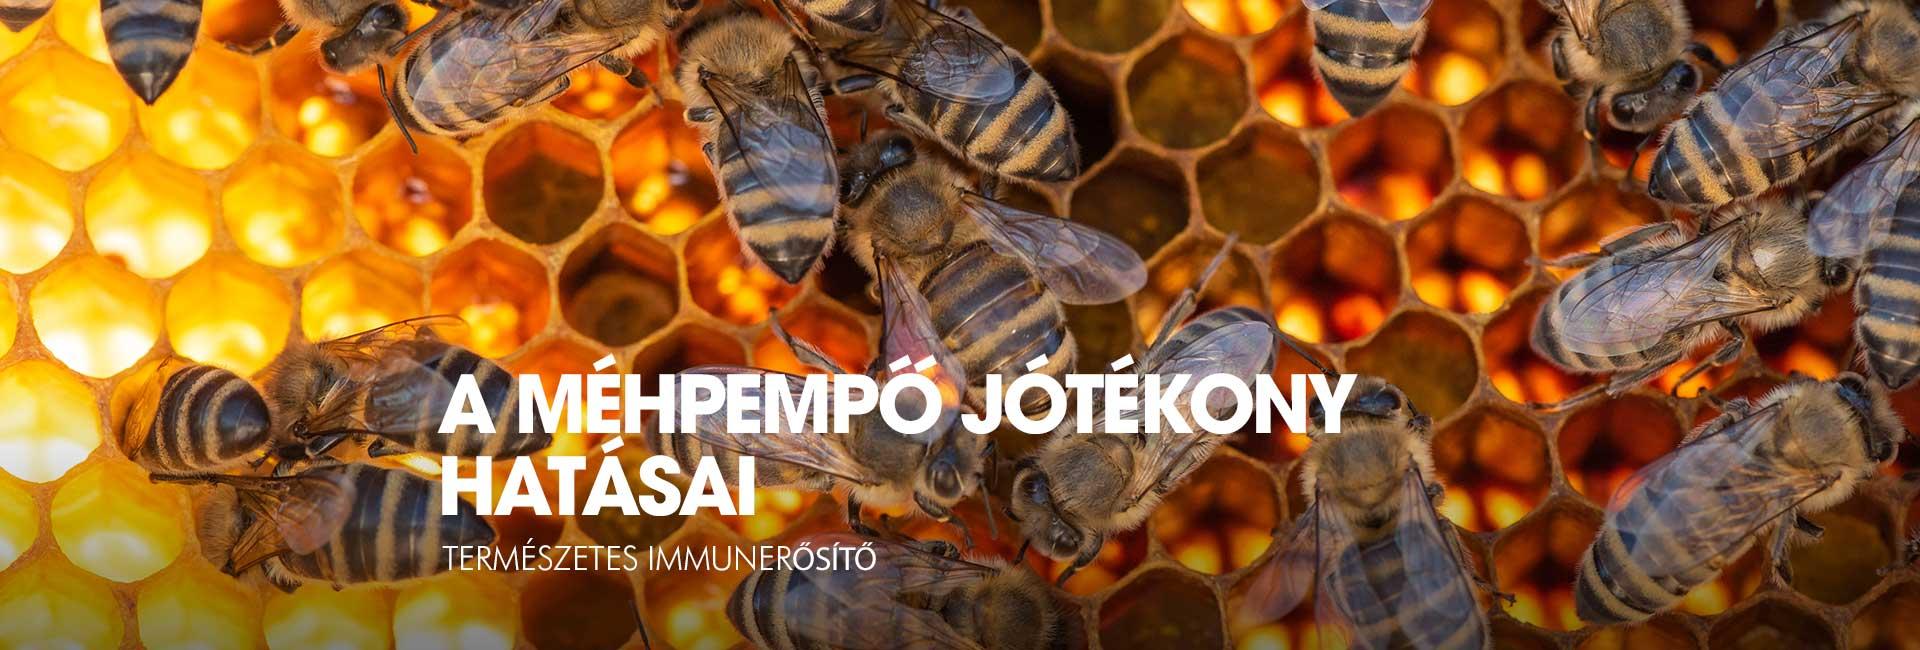 mehpempo-hatasai4